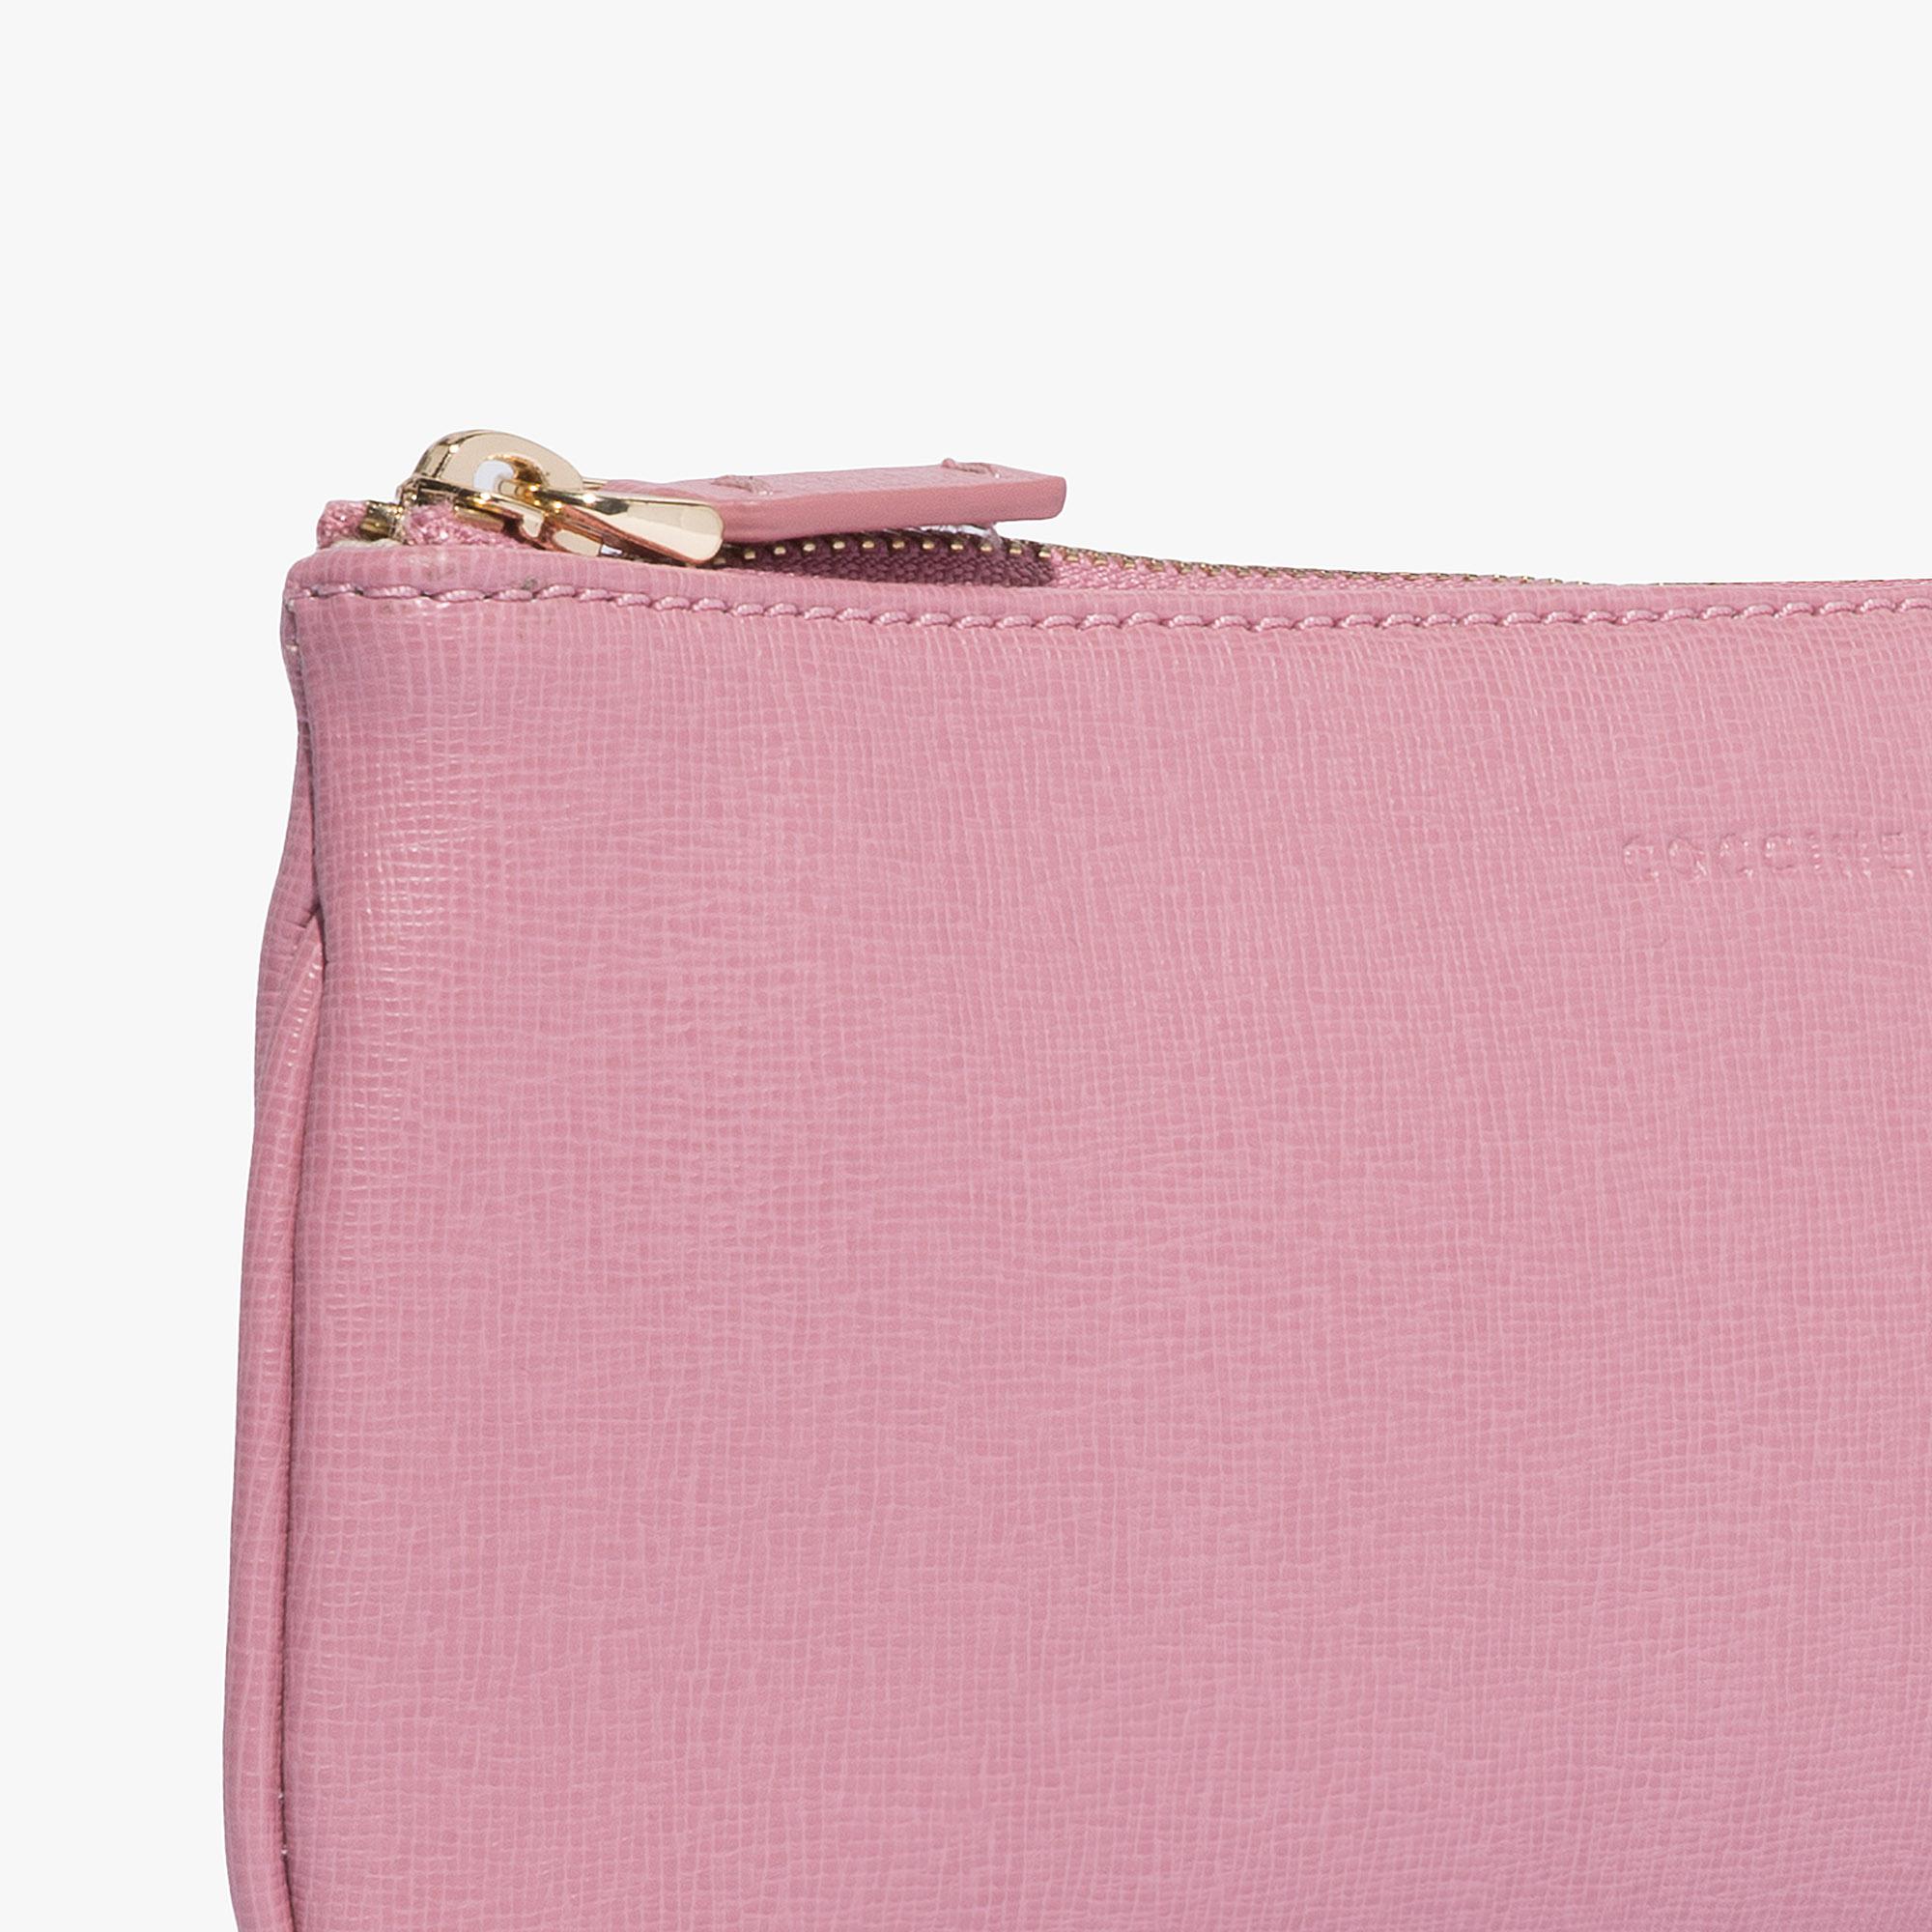 Saffiano leather clutch bag